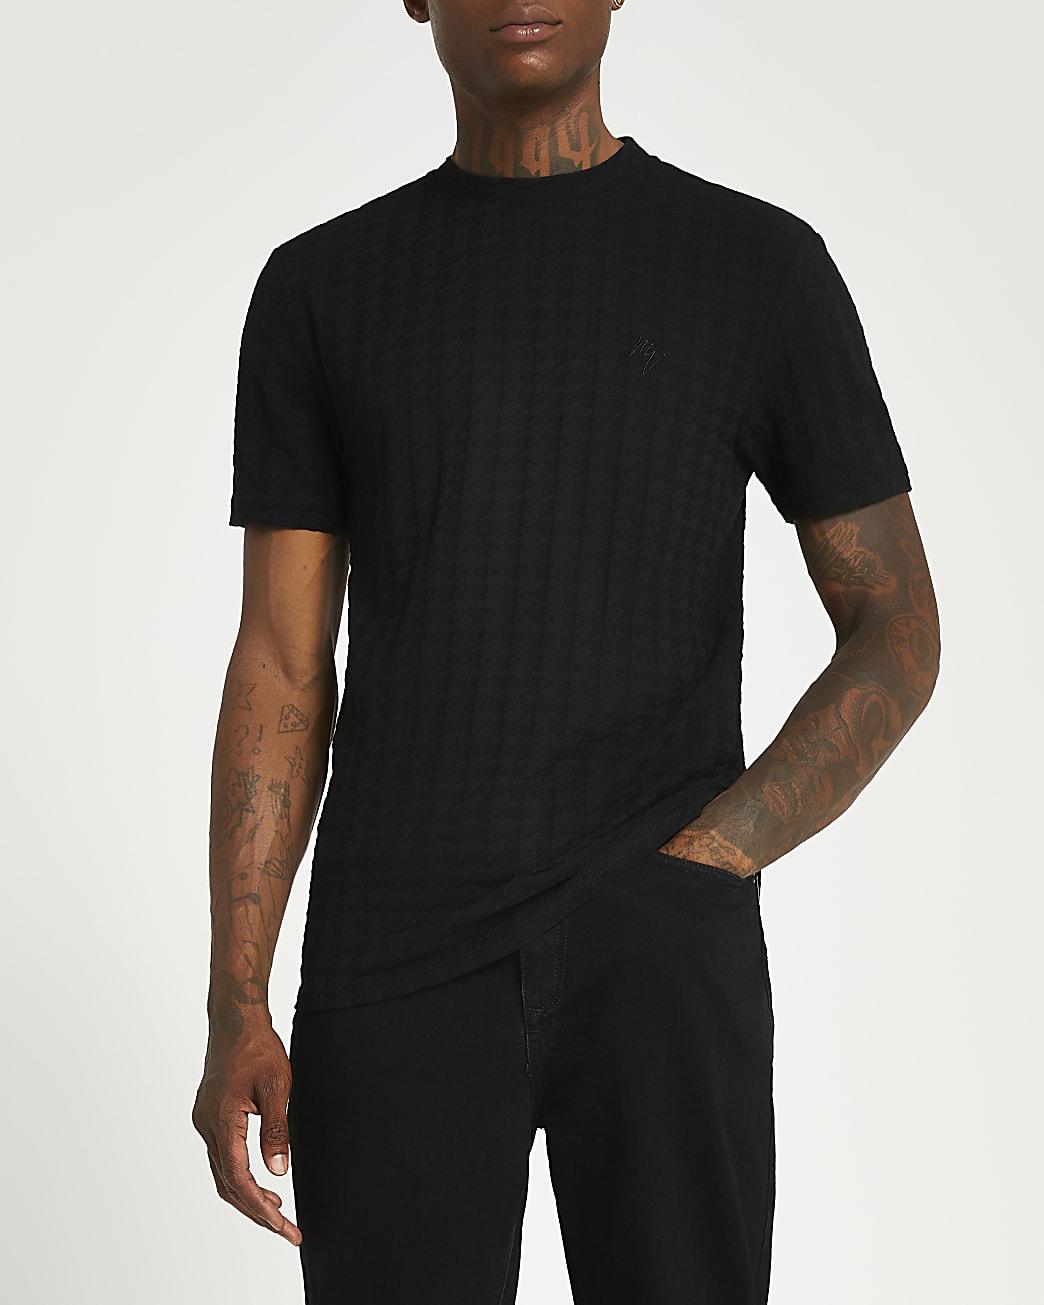 Maison Riviera black slim fit t-shirt